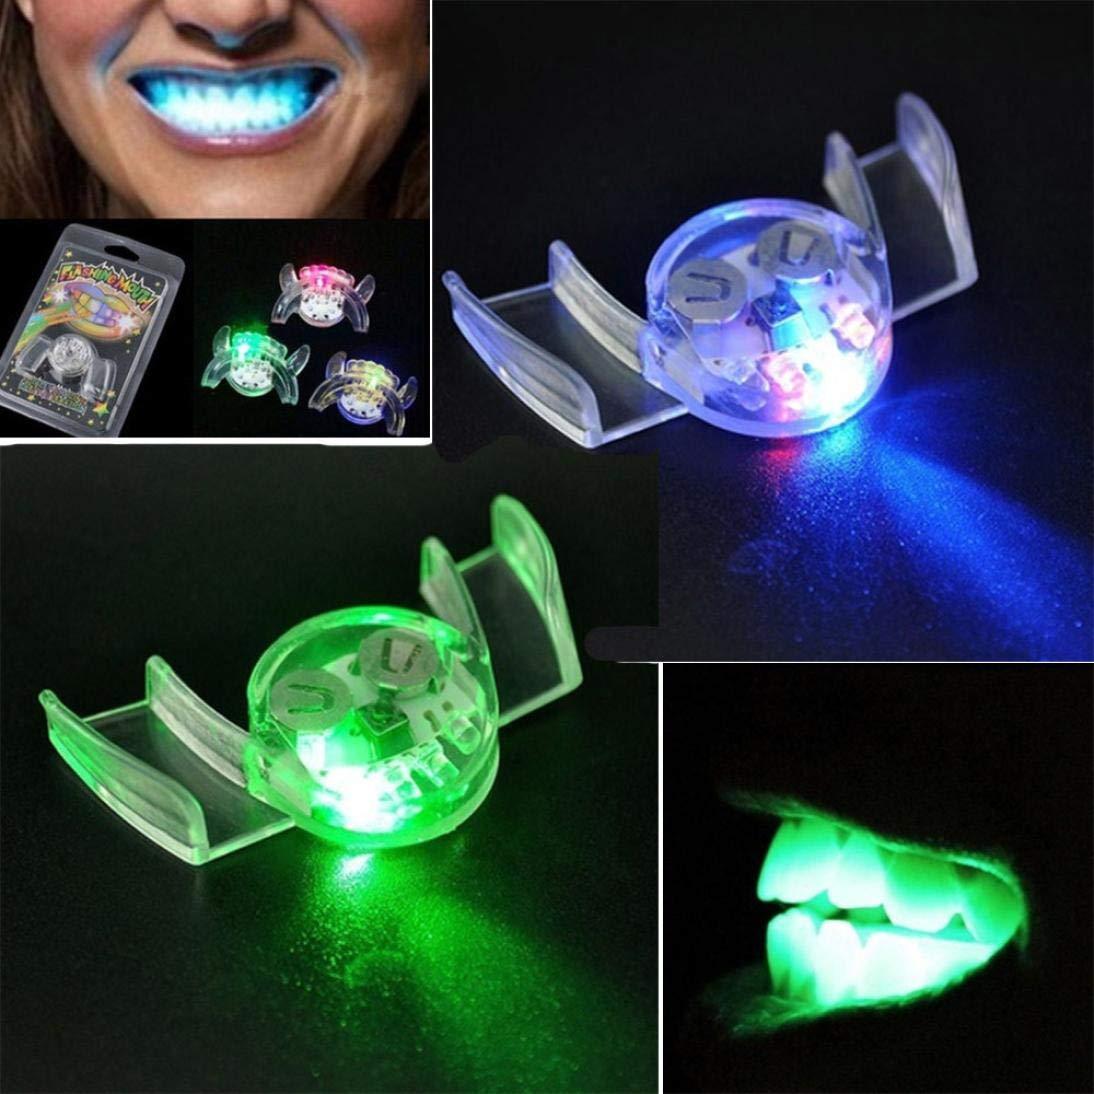 LED Flashing Teeth,Kasien 2Pcs Flashing LED Light Up Mouth Braces Piece Glow Teeth For Halloween Party (LED Flashing Teeth)